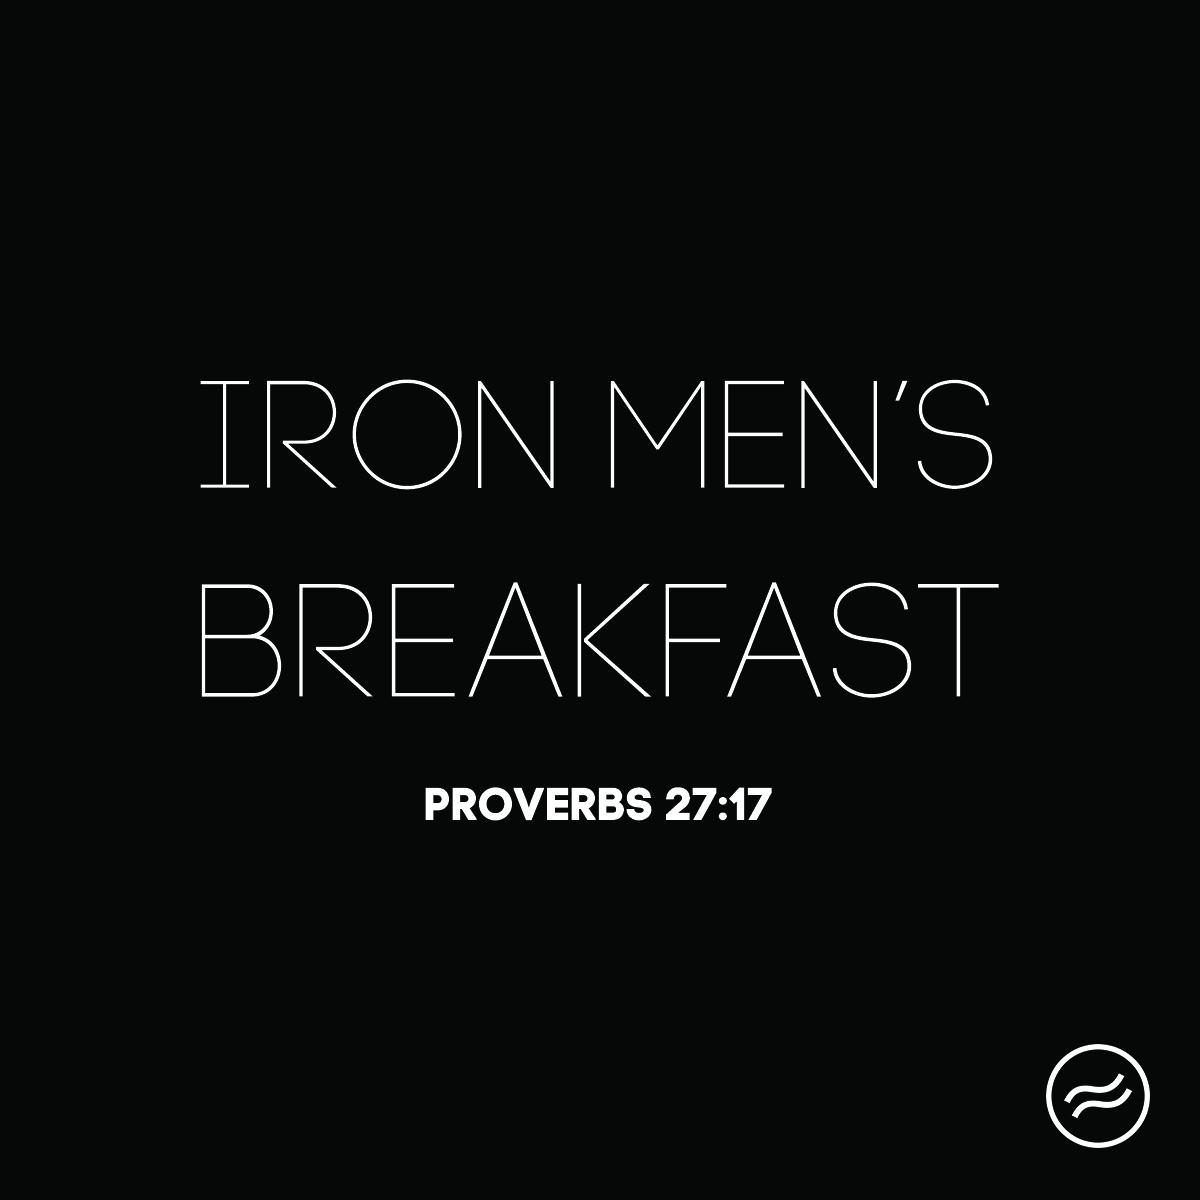 Ironmensbreakfast instagram 2015